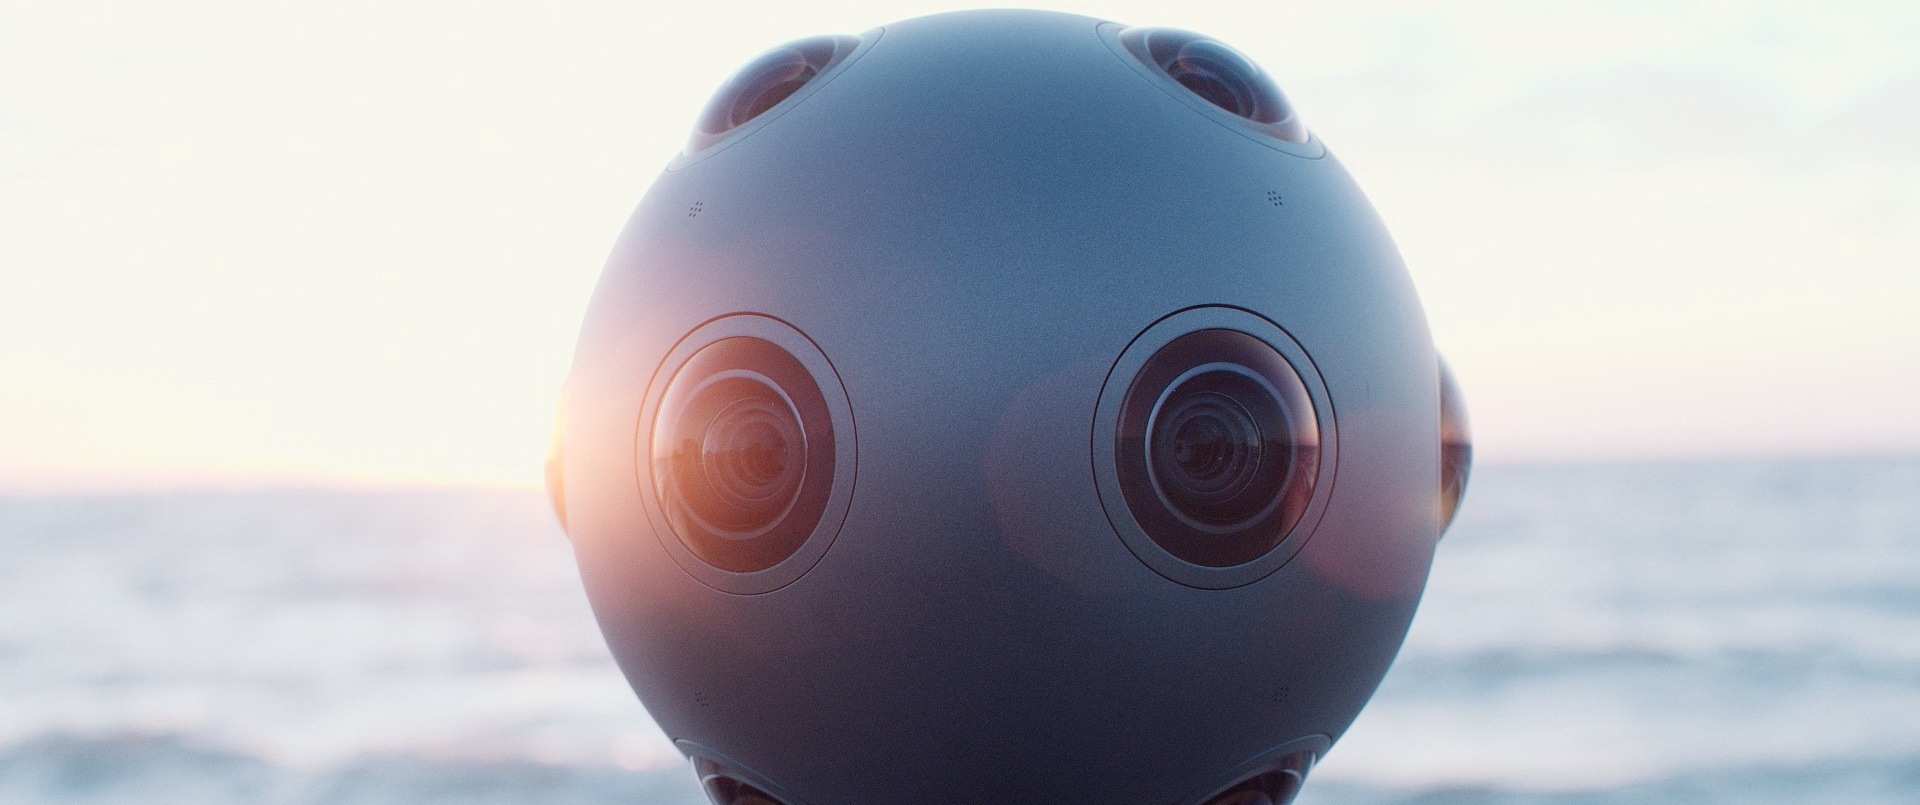 Nokia анонсировала панорамную камеру OZO